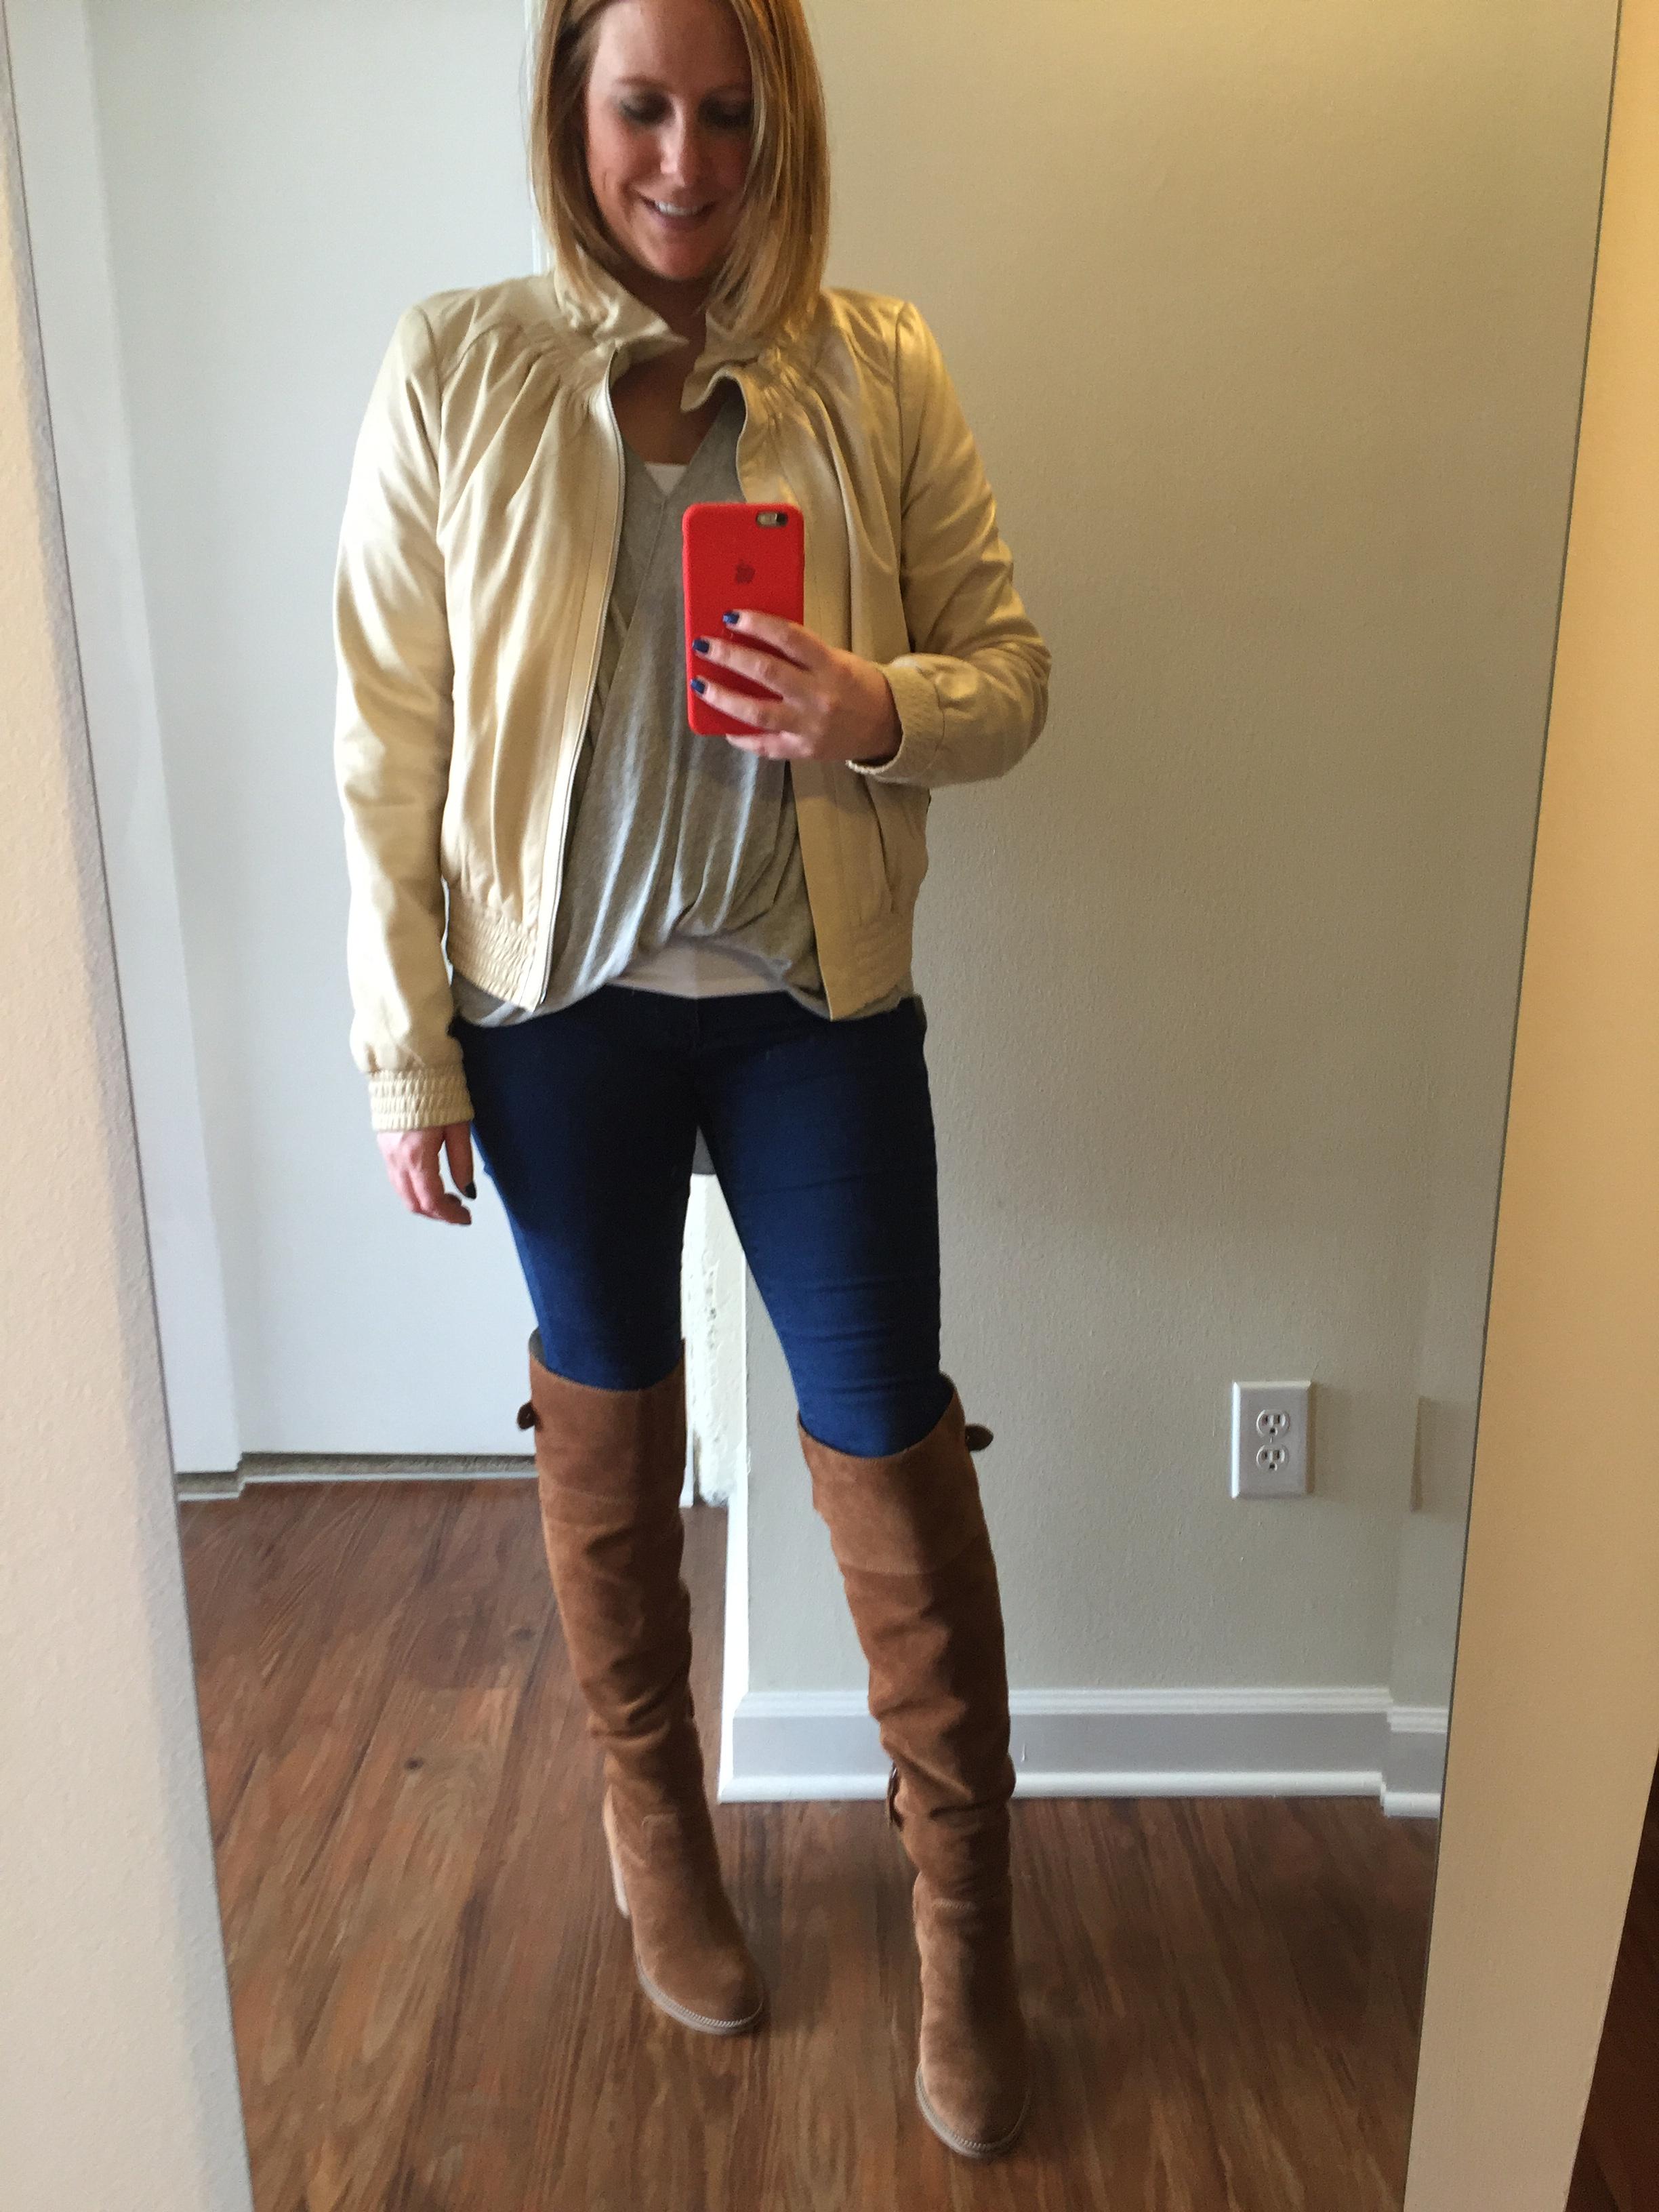 Jacket: Nordstom, Hinge, Shirt: Urban Outfitters,  Silence + Noise Wonderland Surplice Top ,Jeans:  1969 Resolution legging jean , Boots: Dolce Vita,  OkanaKnee Boot